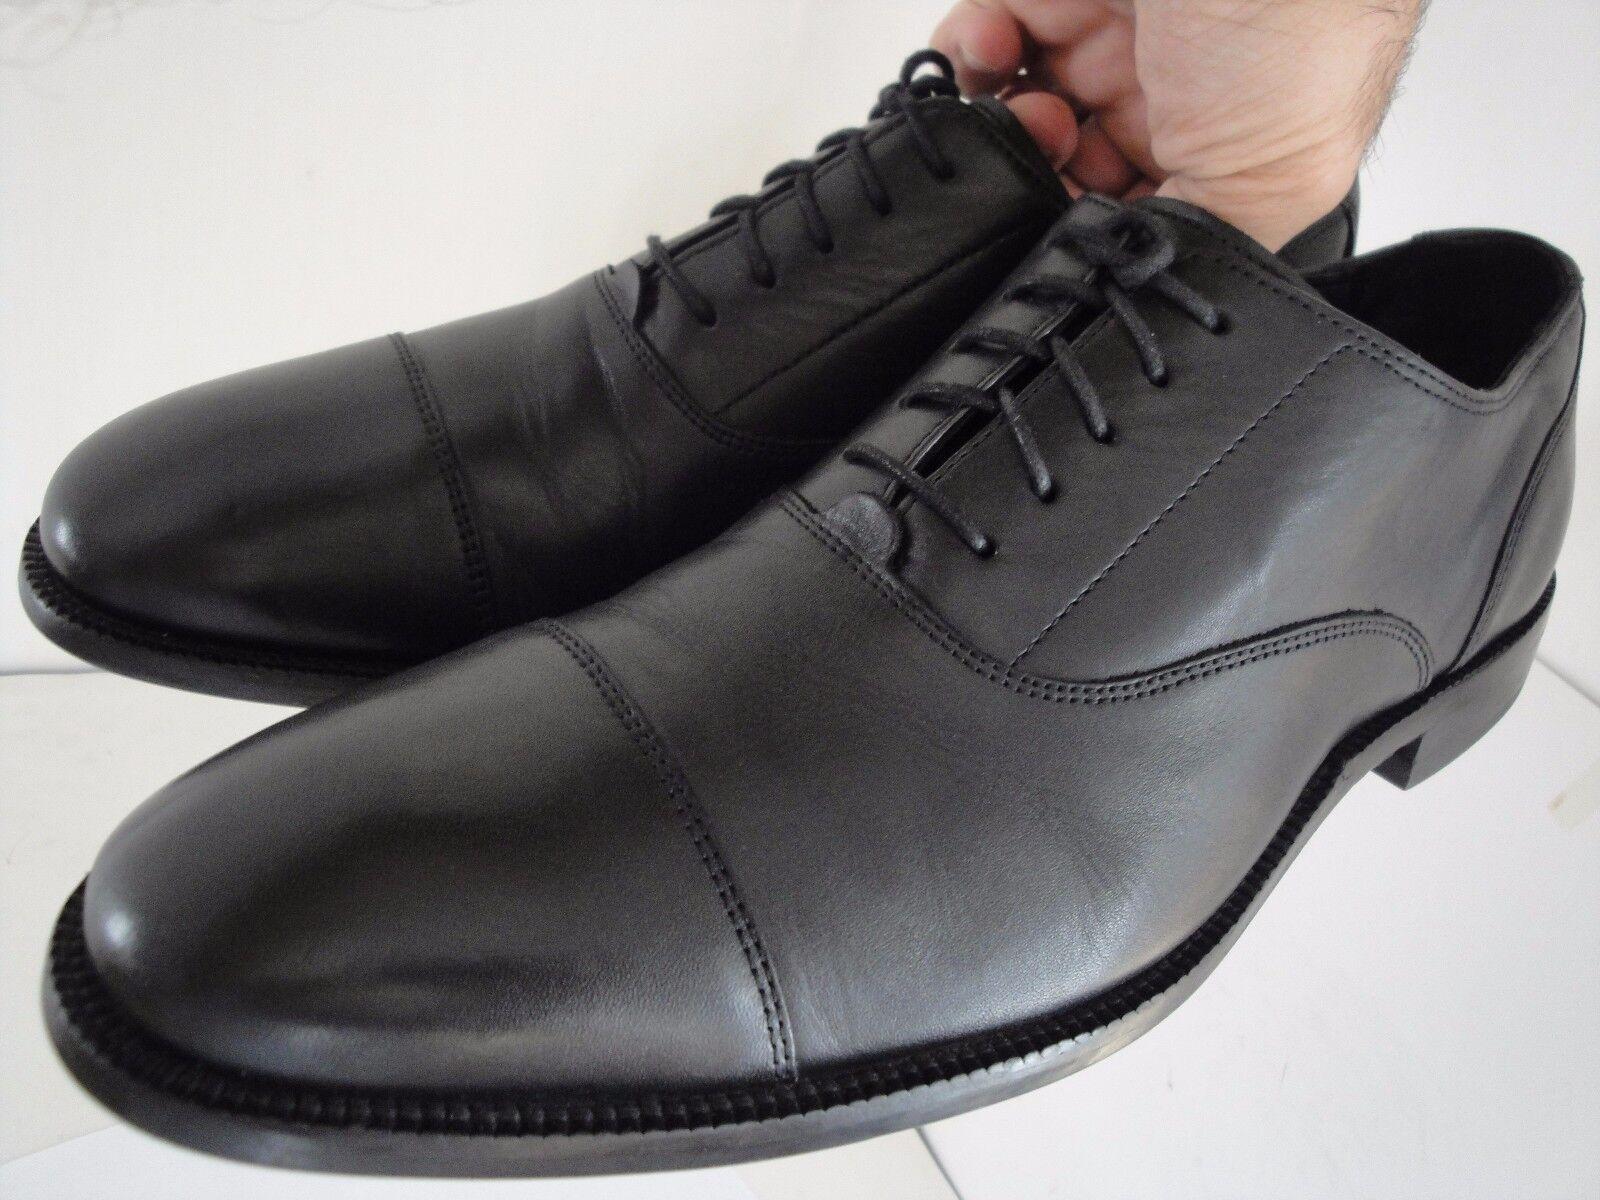 Cole Haan  Air Williams Cap Toe Oxfords US Schuhes for Men sz US Oxfords 10.5 Retail 225 eacfa5